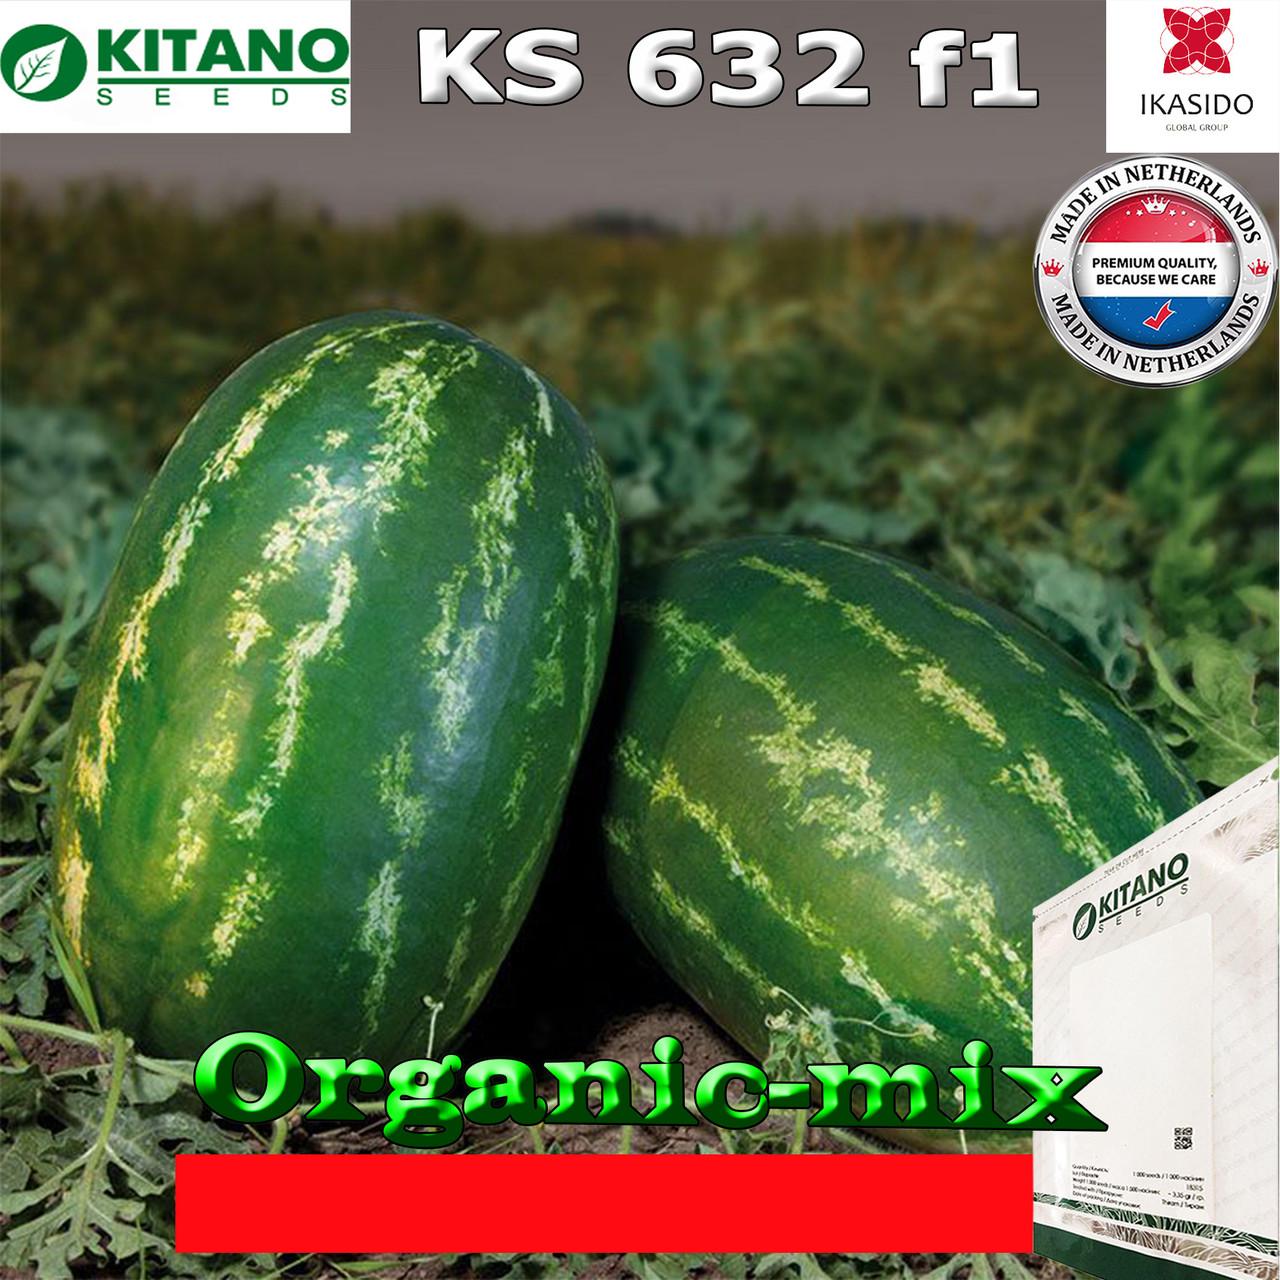 Арбуз KS 632 F1 от ТМ KITANO SEEDS, 1000 семян (Нидерланды)